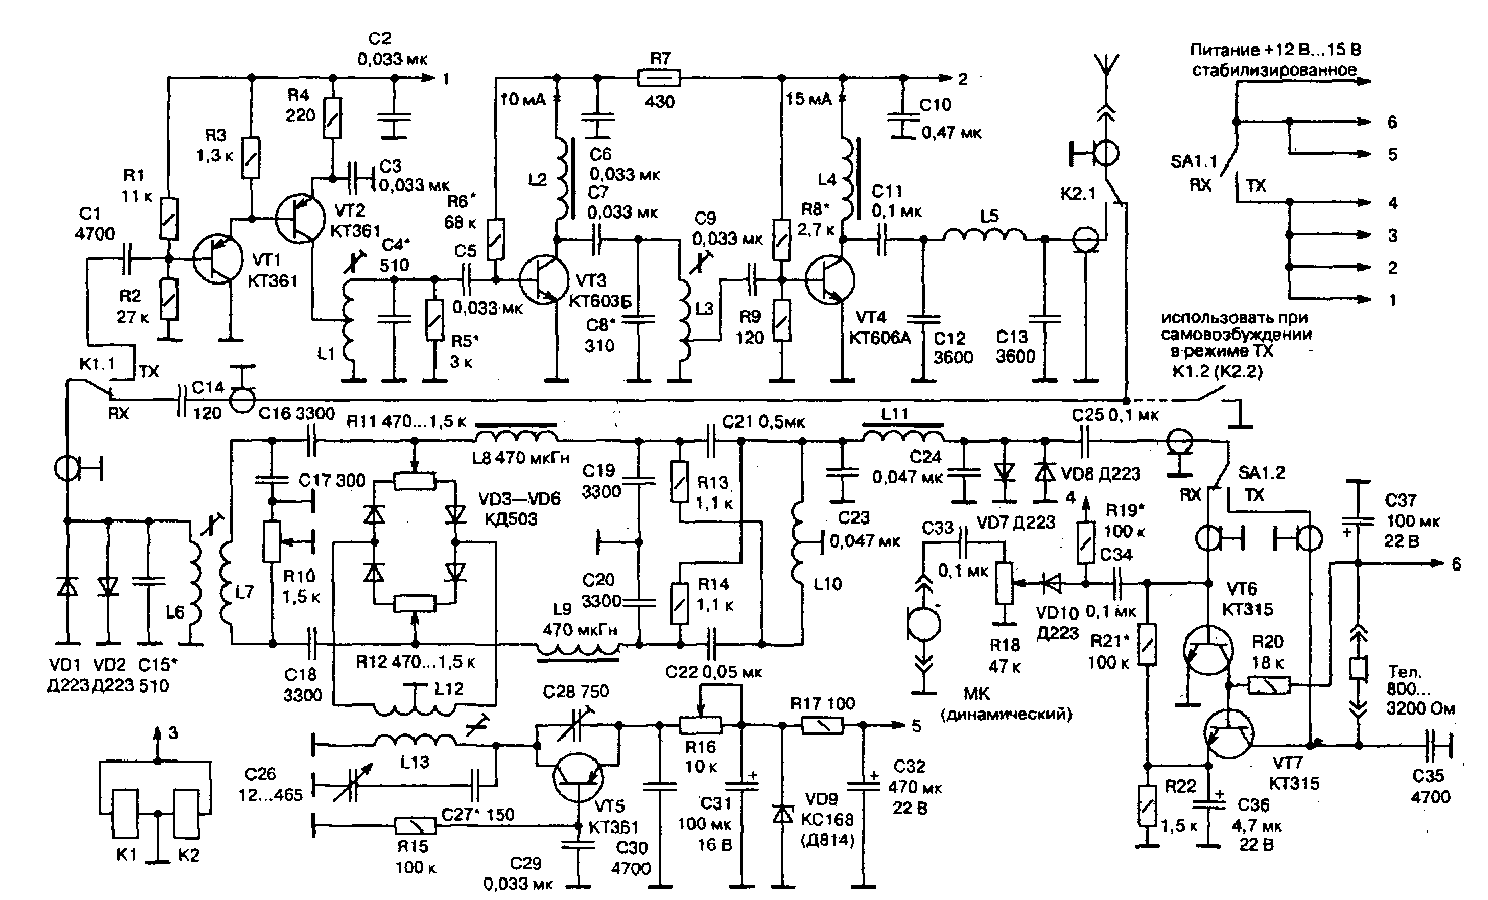 мини трансивер SSB 160 метров схема